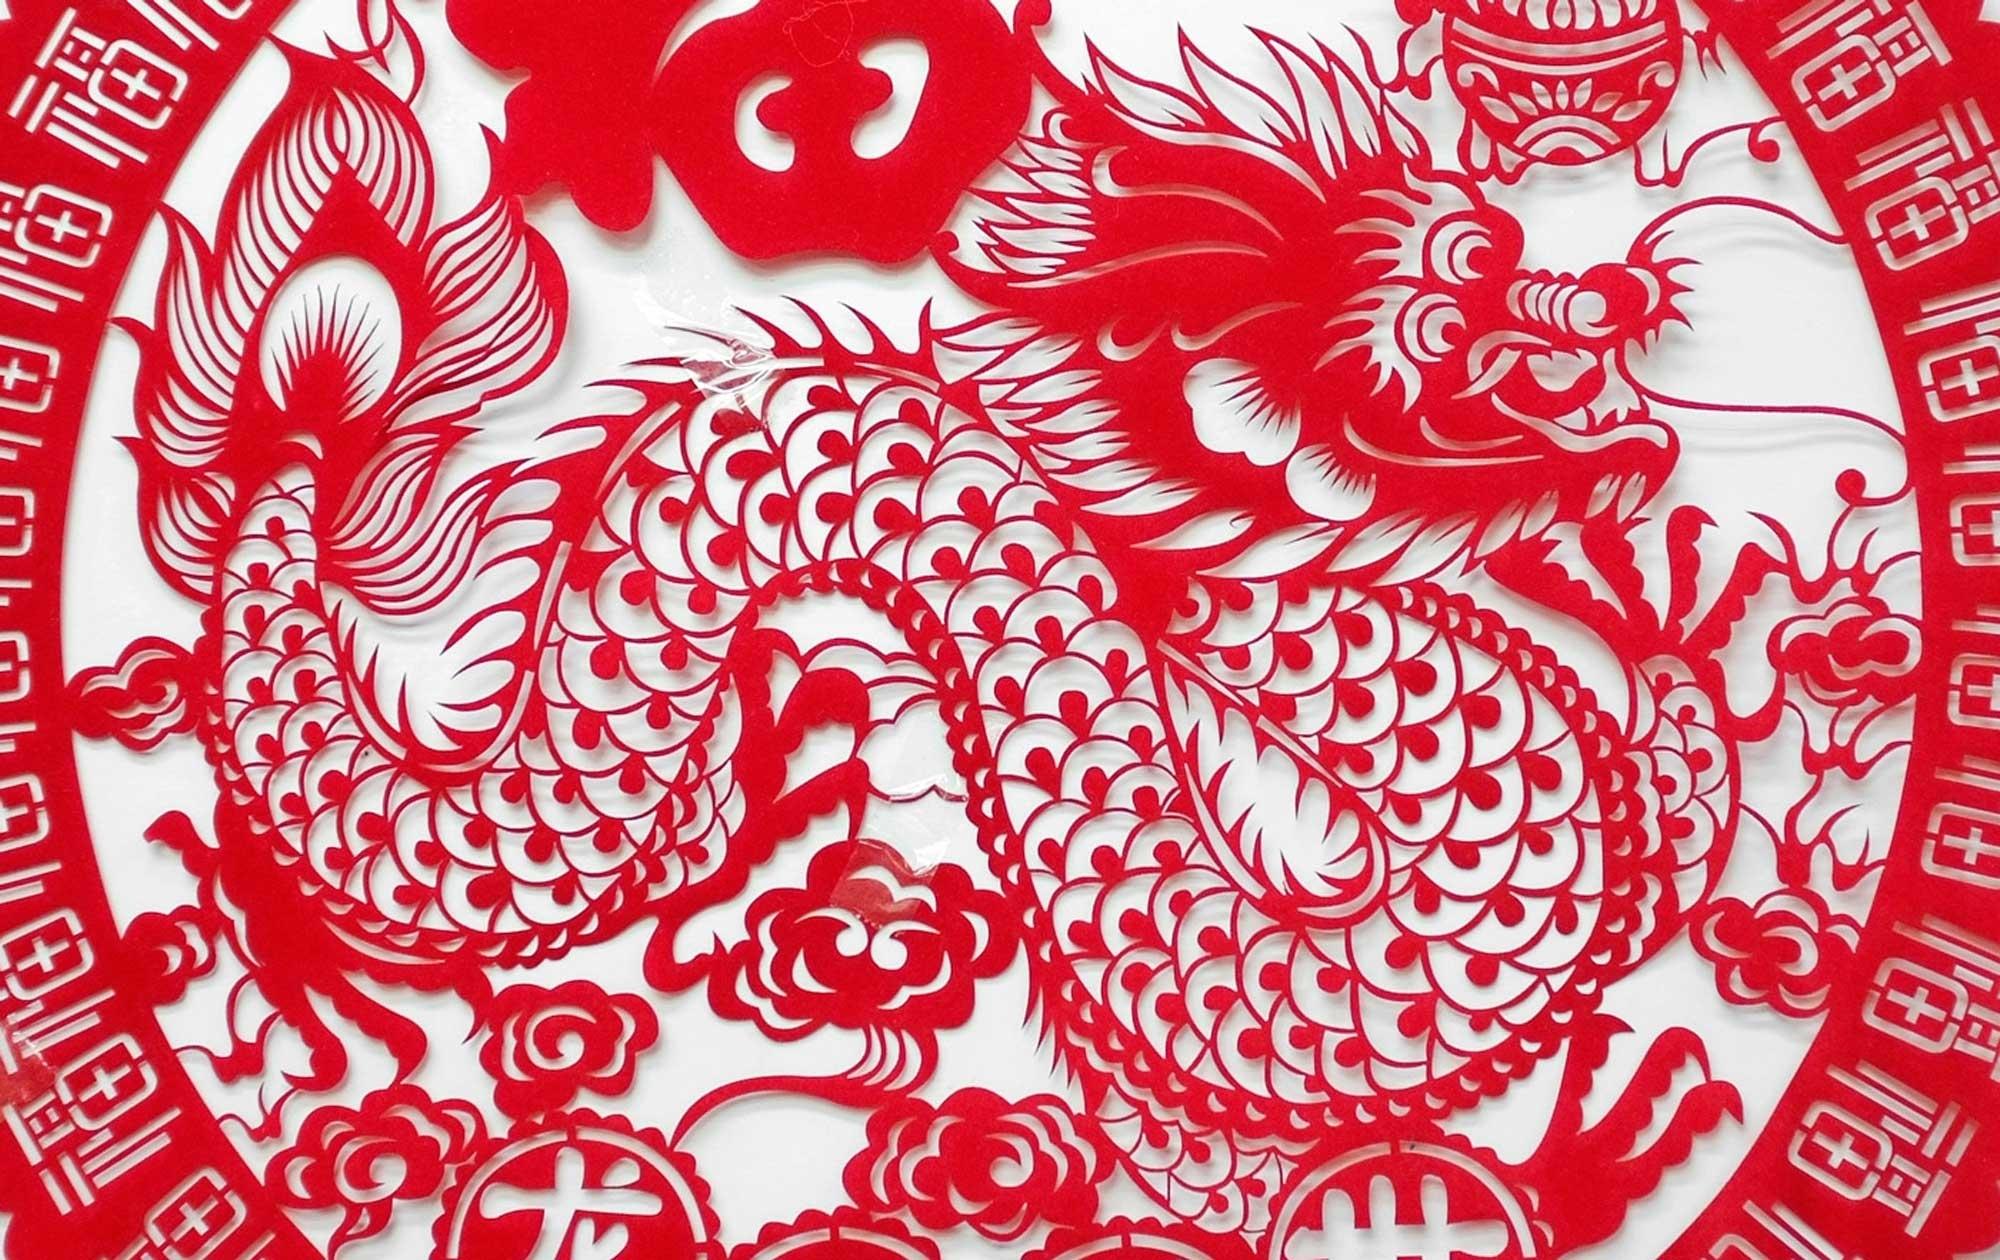 The Chinese Lunar Calendar - Agaunews